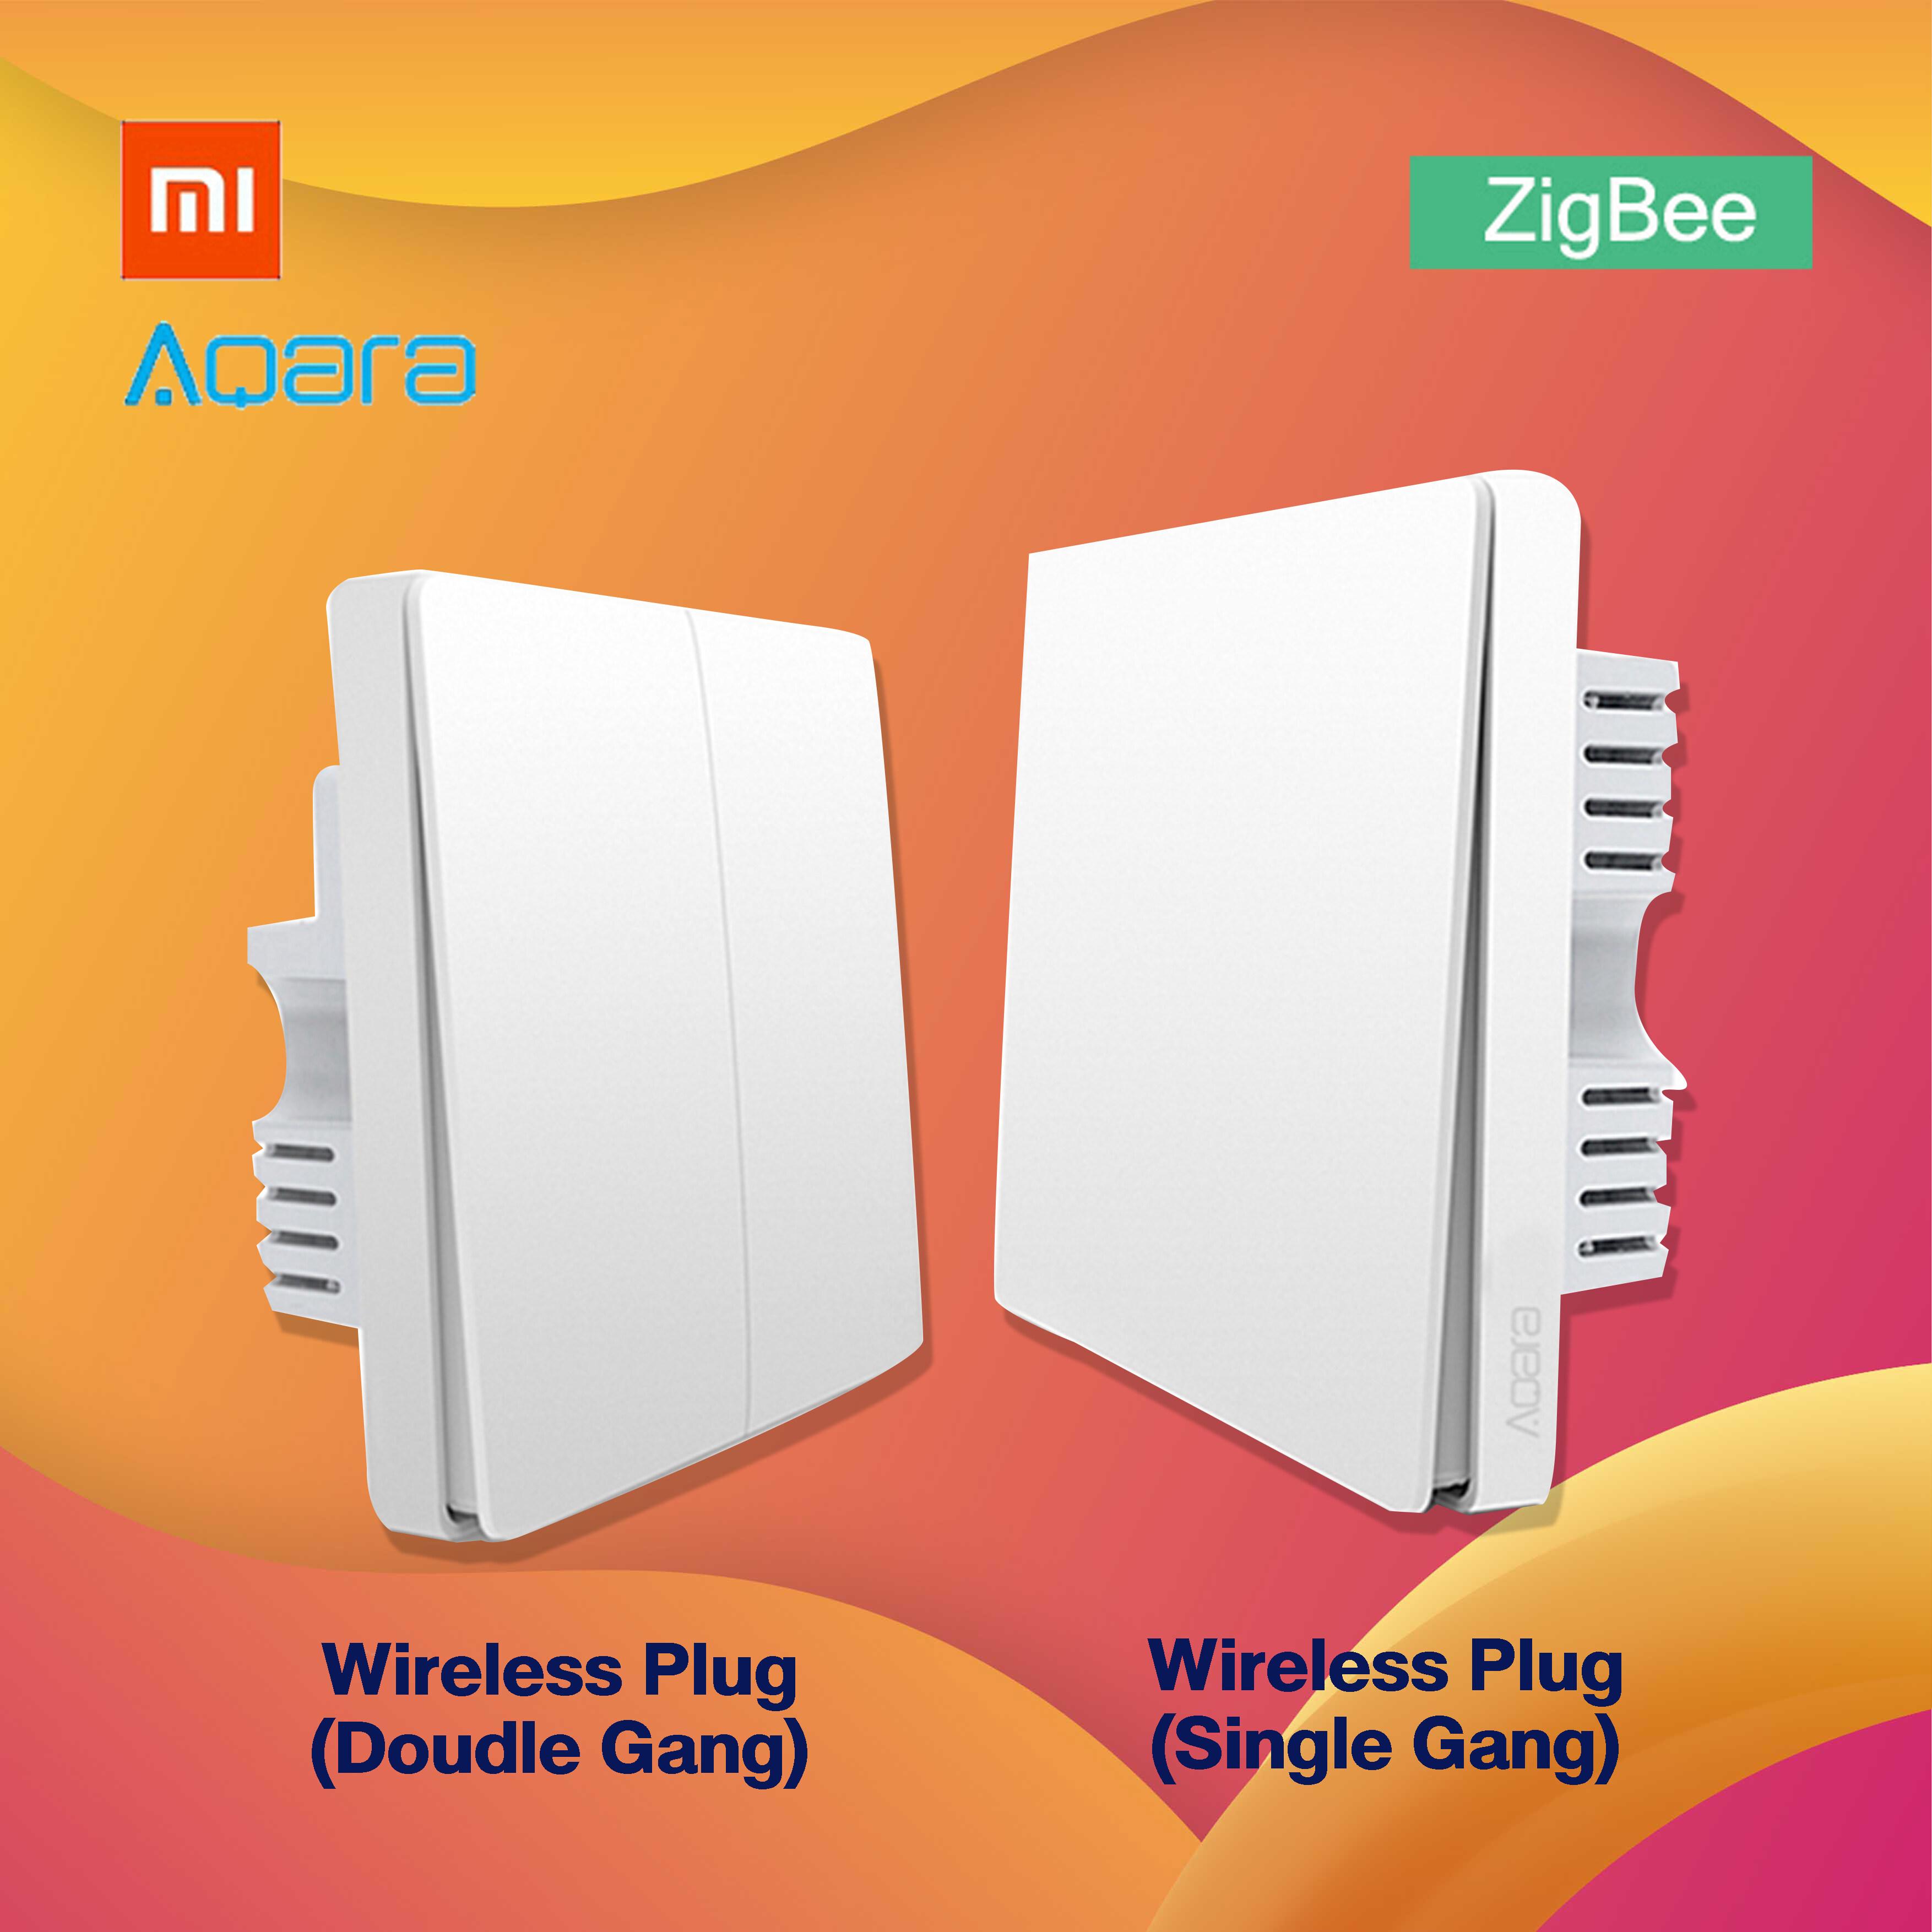 AQARA Wall Switch ZigBee Neutral Line แบบมีสาย N และไม่มีสาย N สวิตช์ไฟอัจฉริยะแบบต่อสาย เชื่อมต่อผ่าน APP Switch ปุ่มควบคุม สำหรับการควบคุมอัจฉริยะ